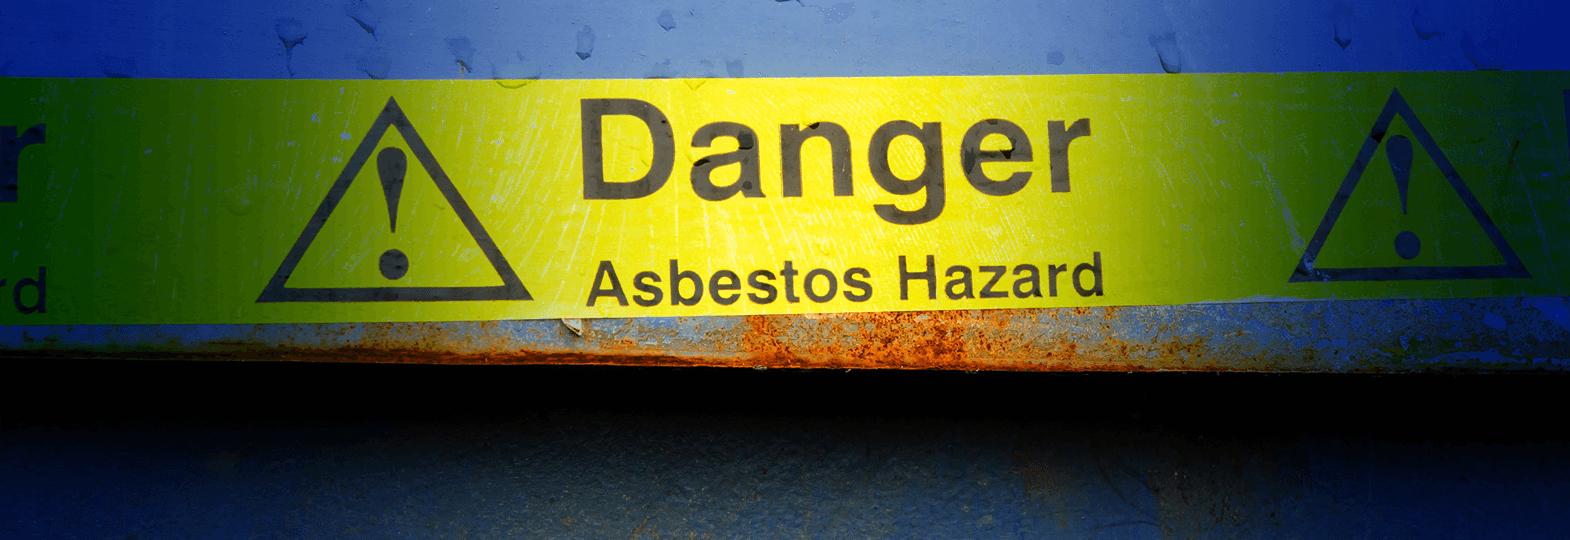 2021_Asbestos_web_hero_1570x540